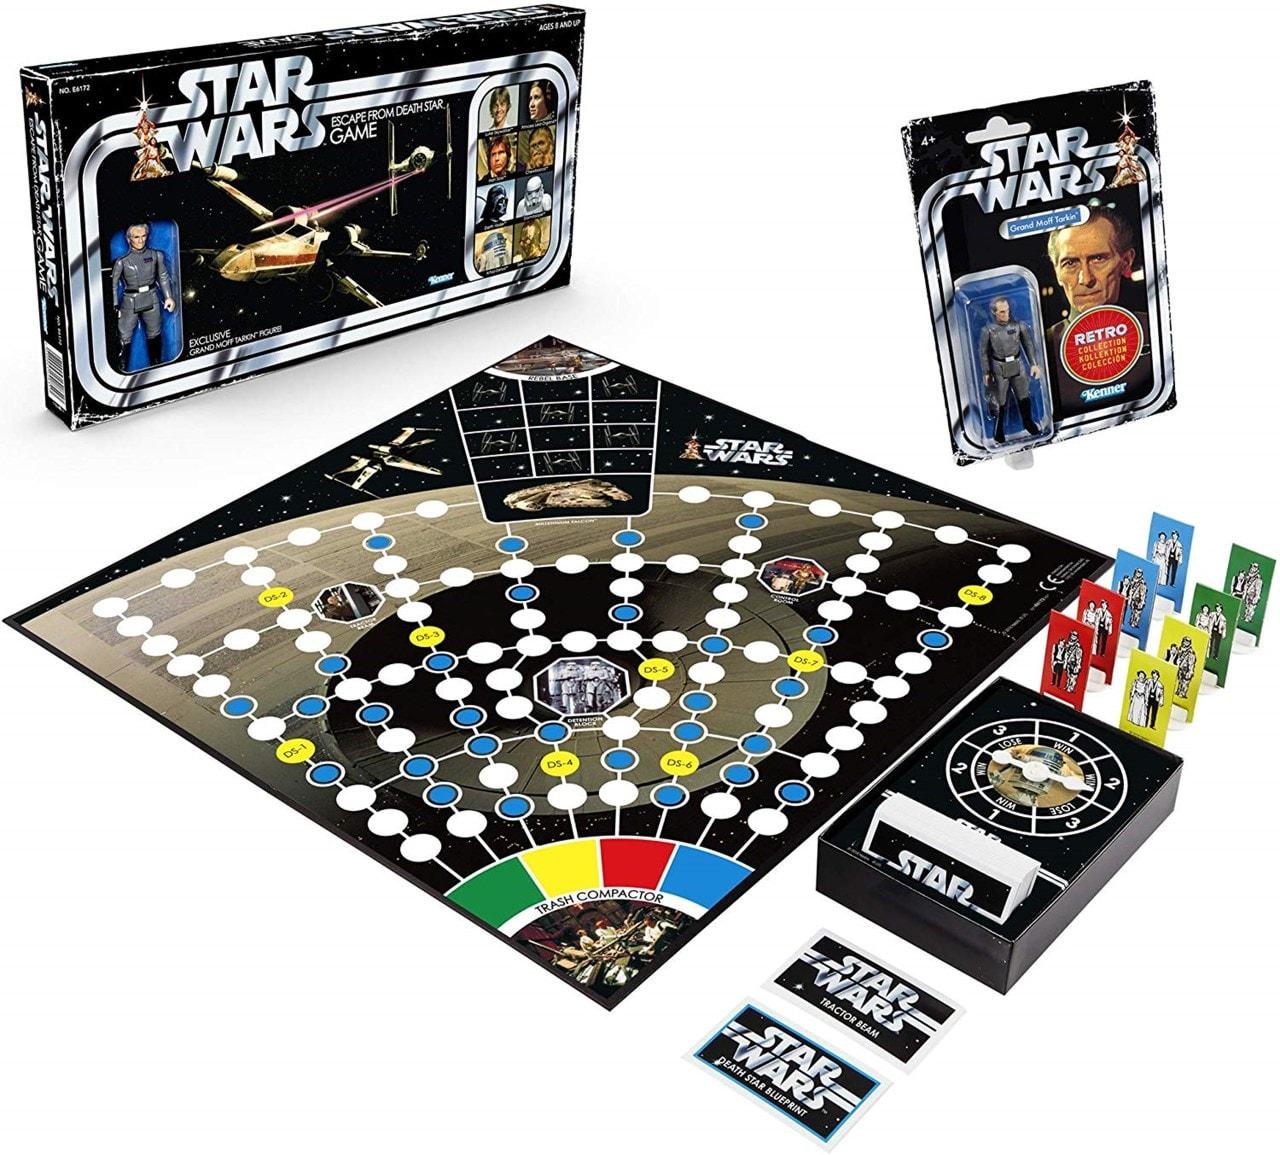 Star Wars Retro Game - 2